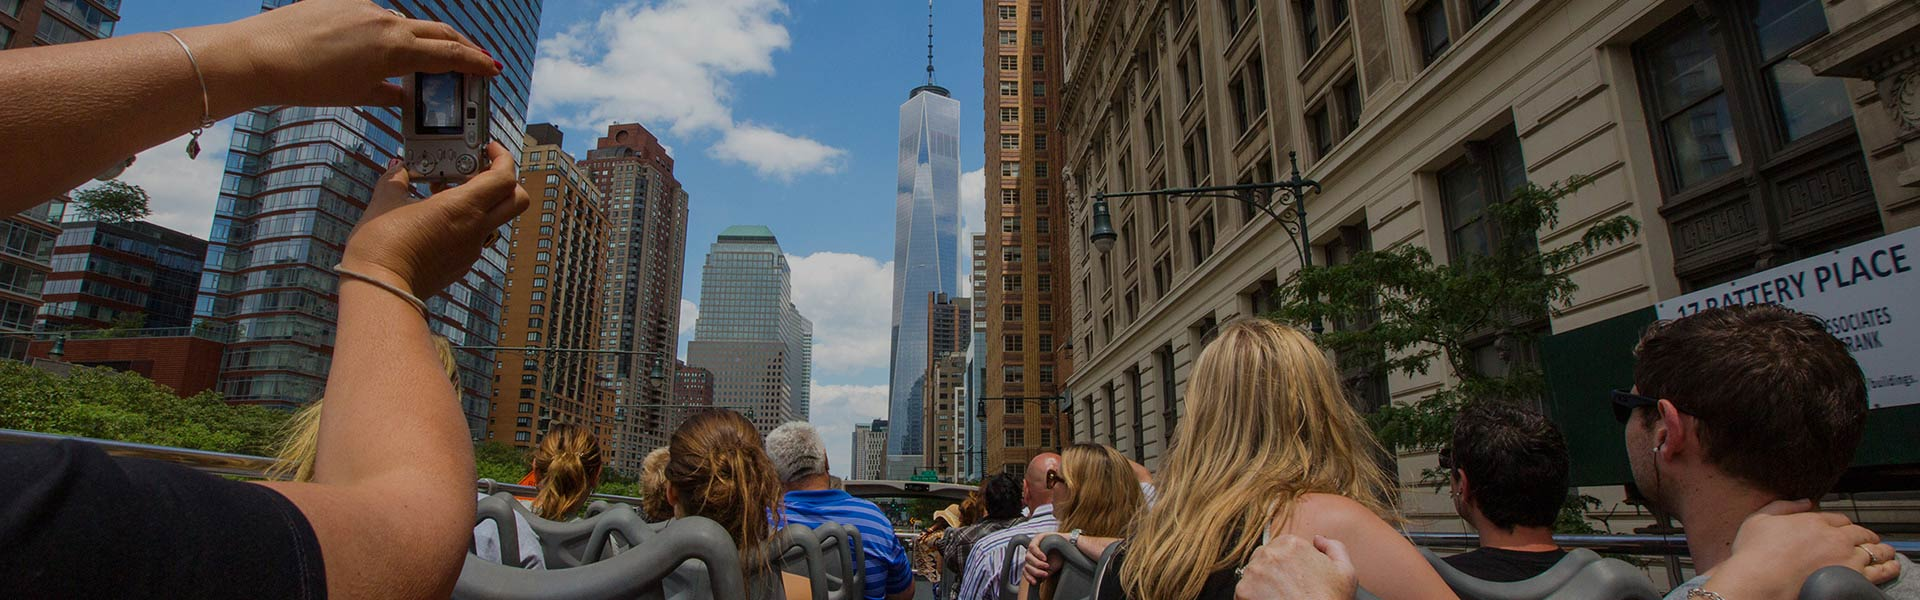 Big Bus open-top tour of New York